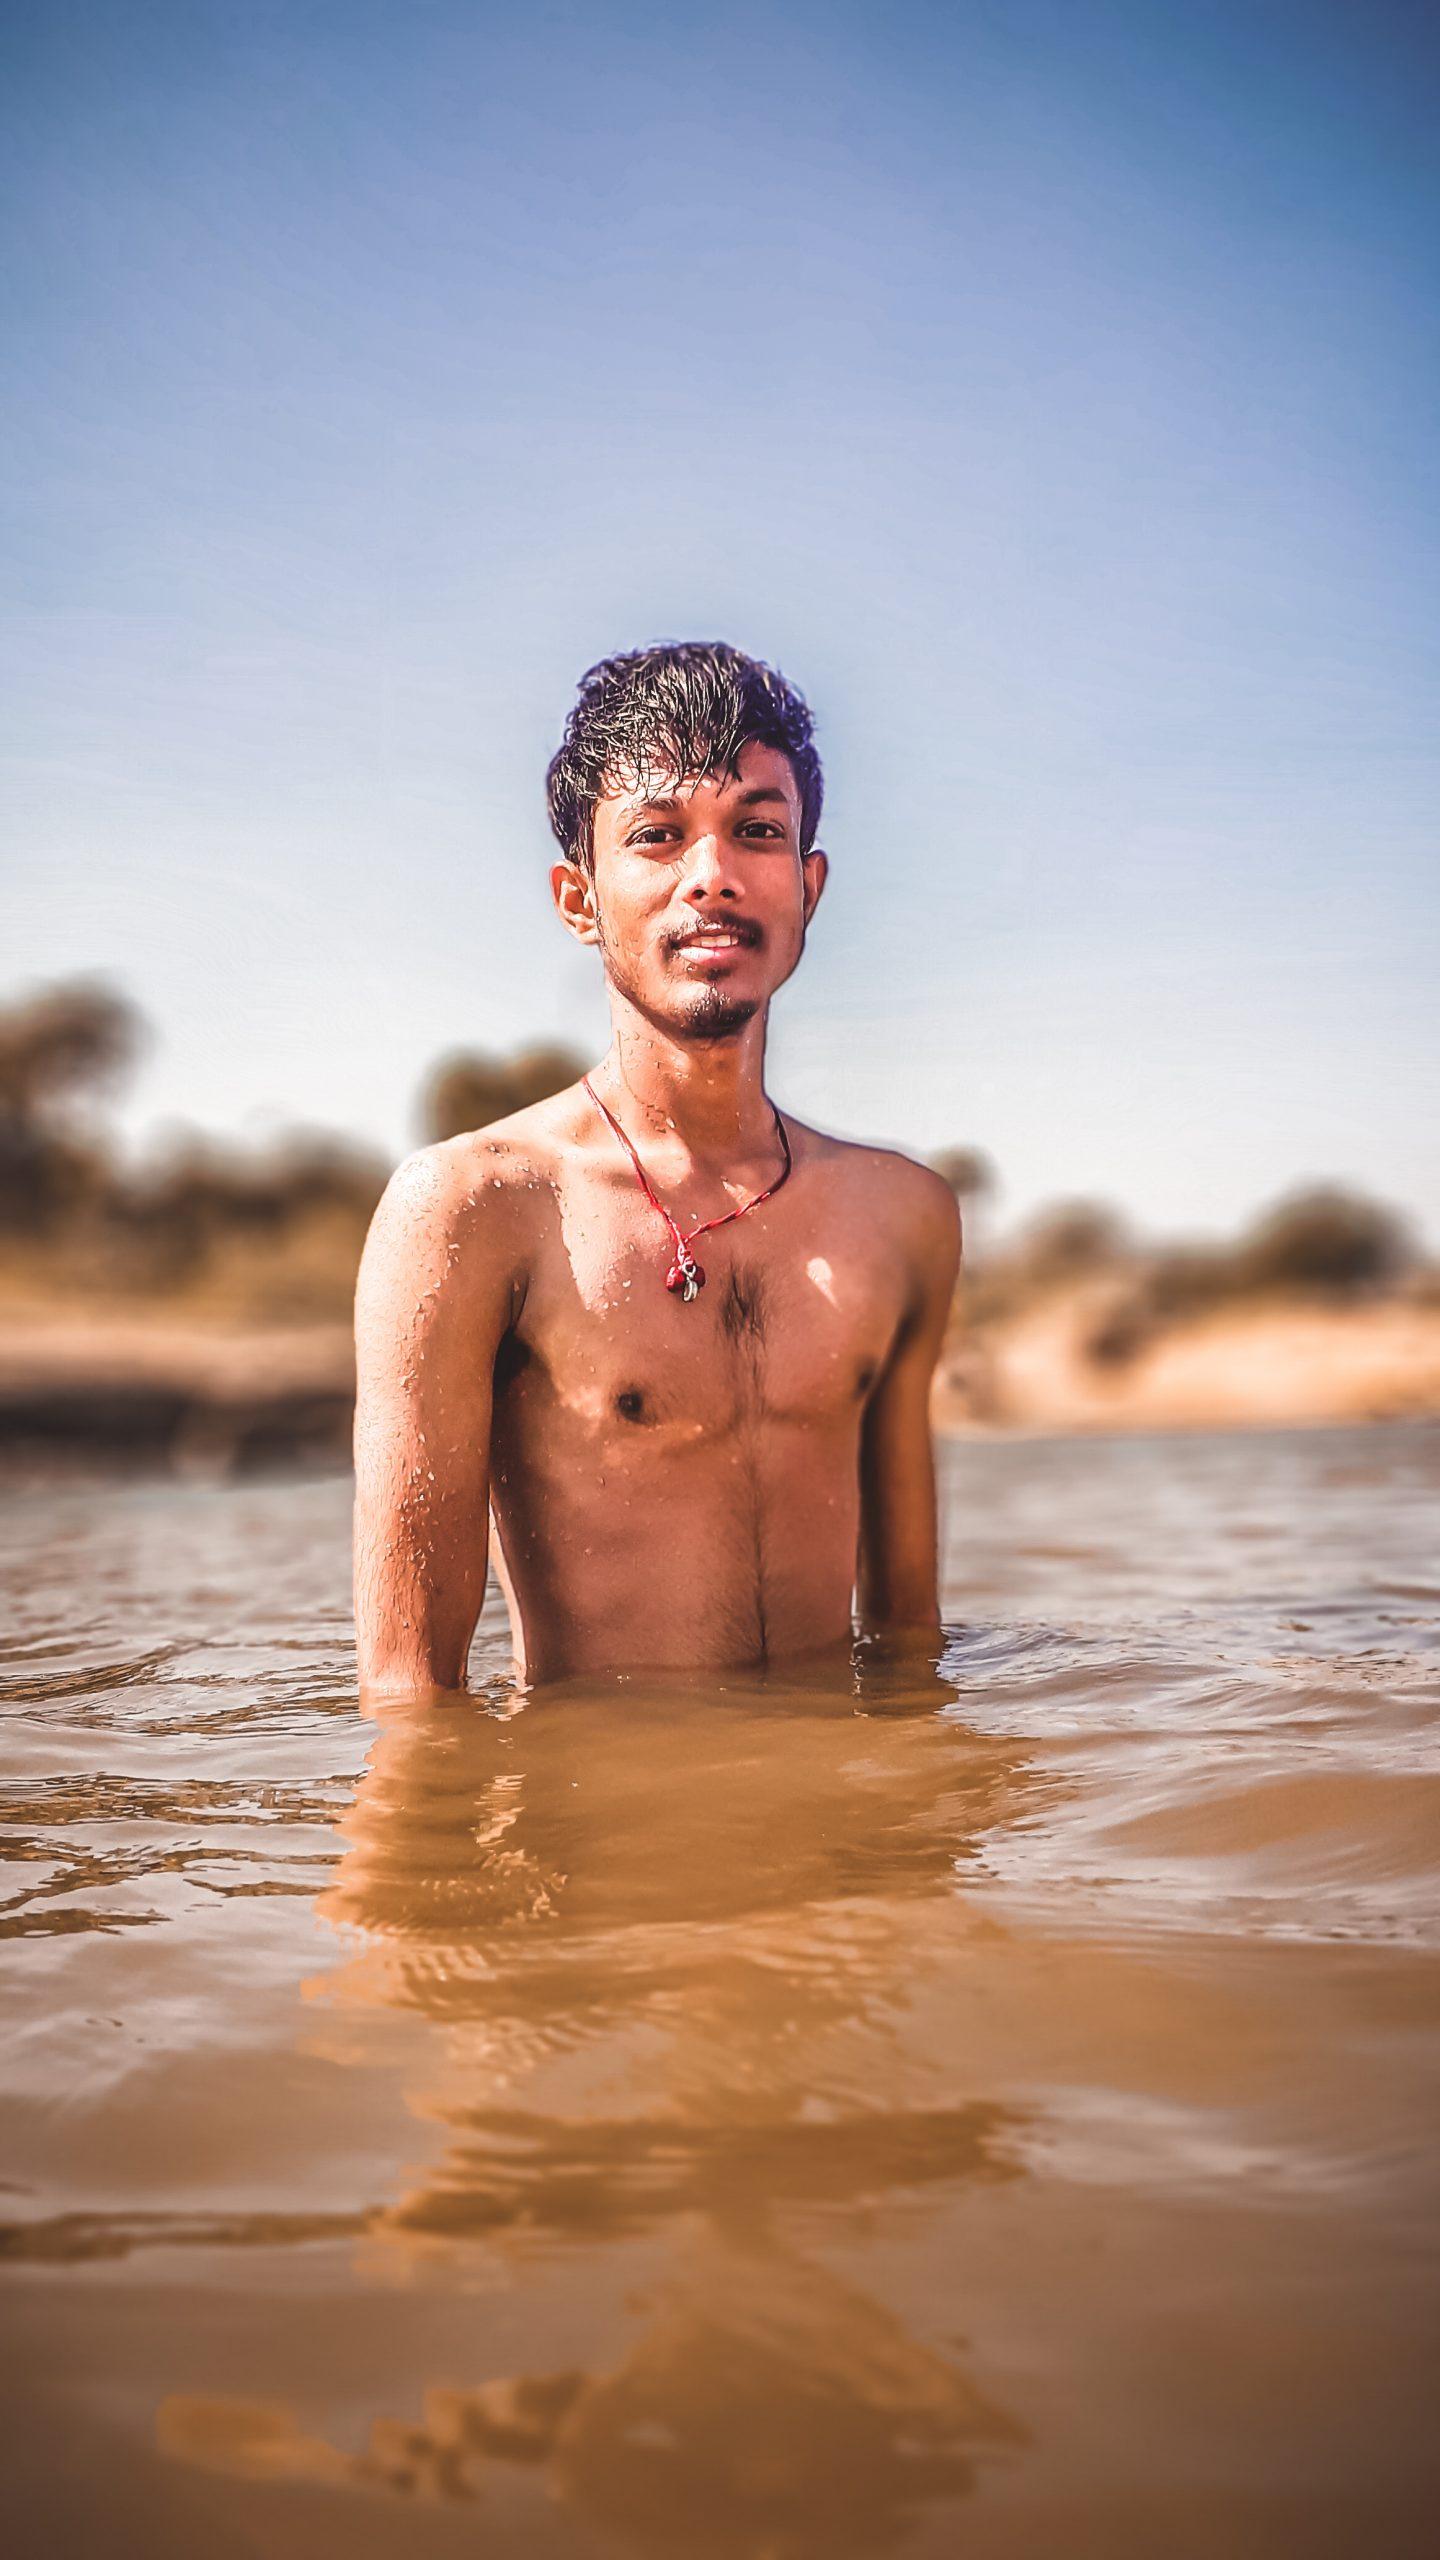 man posing in muddy water